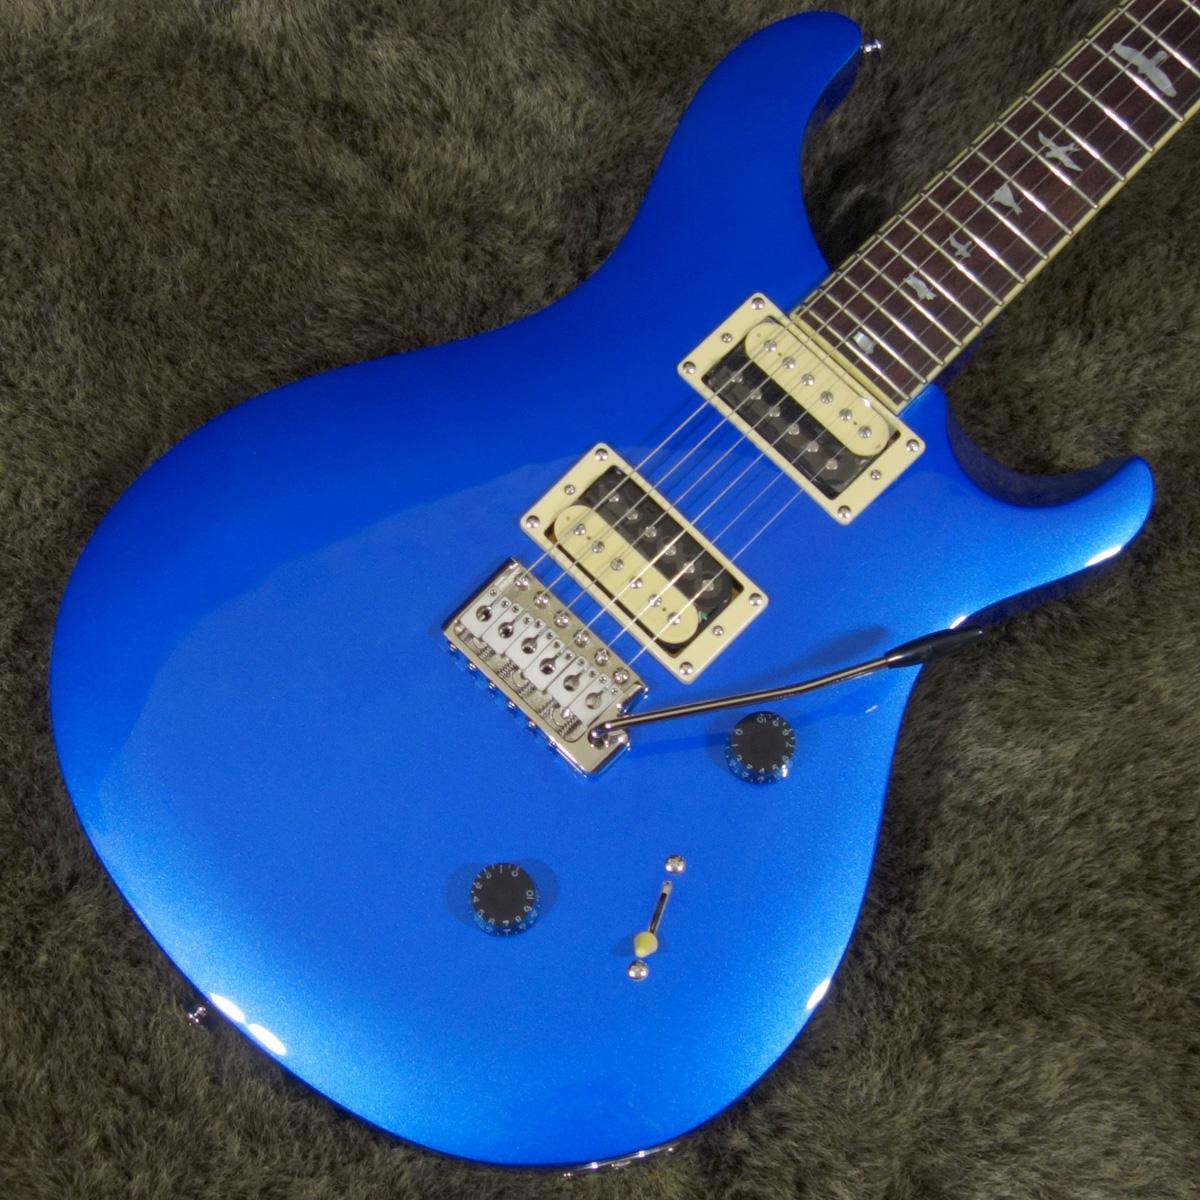 New Paul Reed Smith Se Standard 24 N Royal Blau Metallic Lhz136